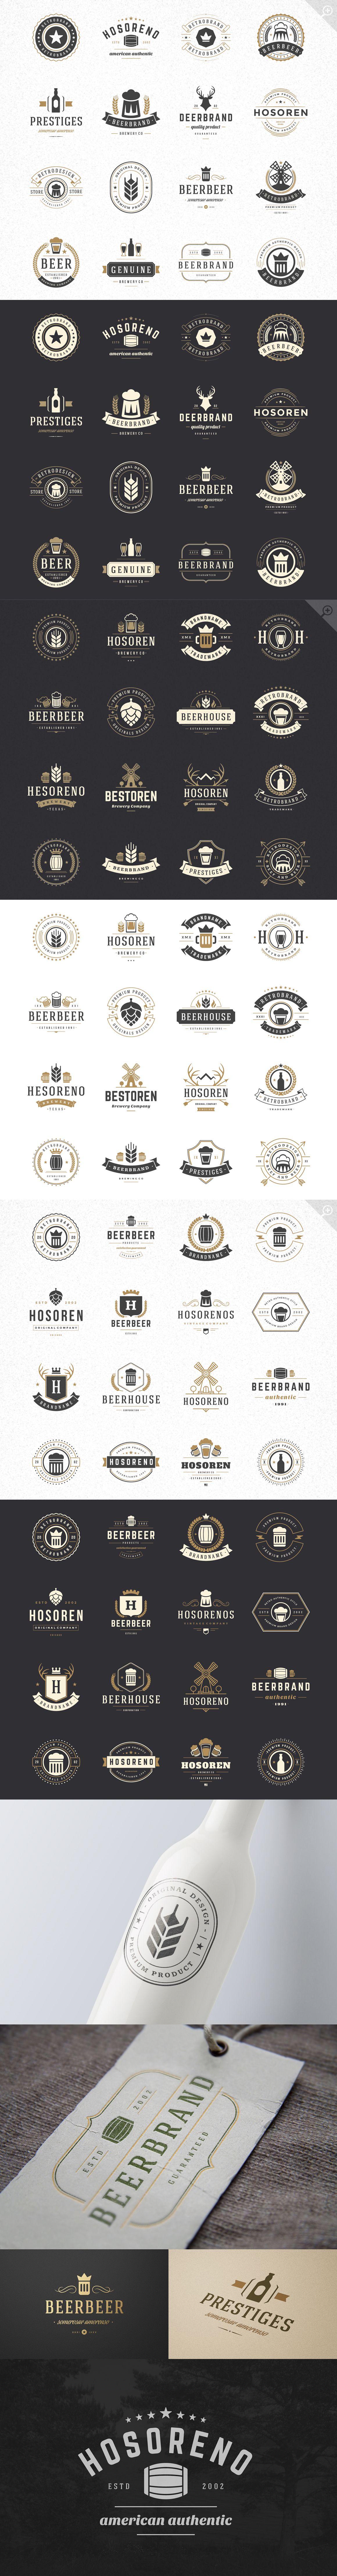 45 Beer brewery Retro Vintage Logotypes set. Vector design elements, business signs, logos, identity, labels, badges, stamps and other #design Download: https://creativemarket.com/VasyaKo/374643-45-Beer-Logotypes-and-Badges?u=ksioks